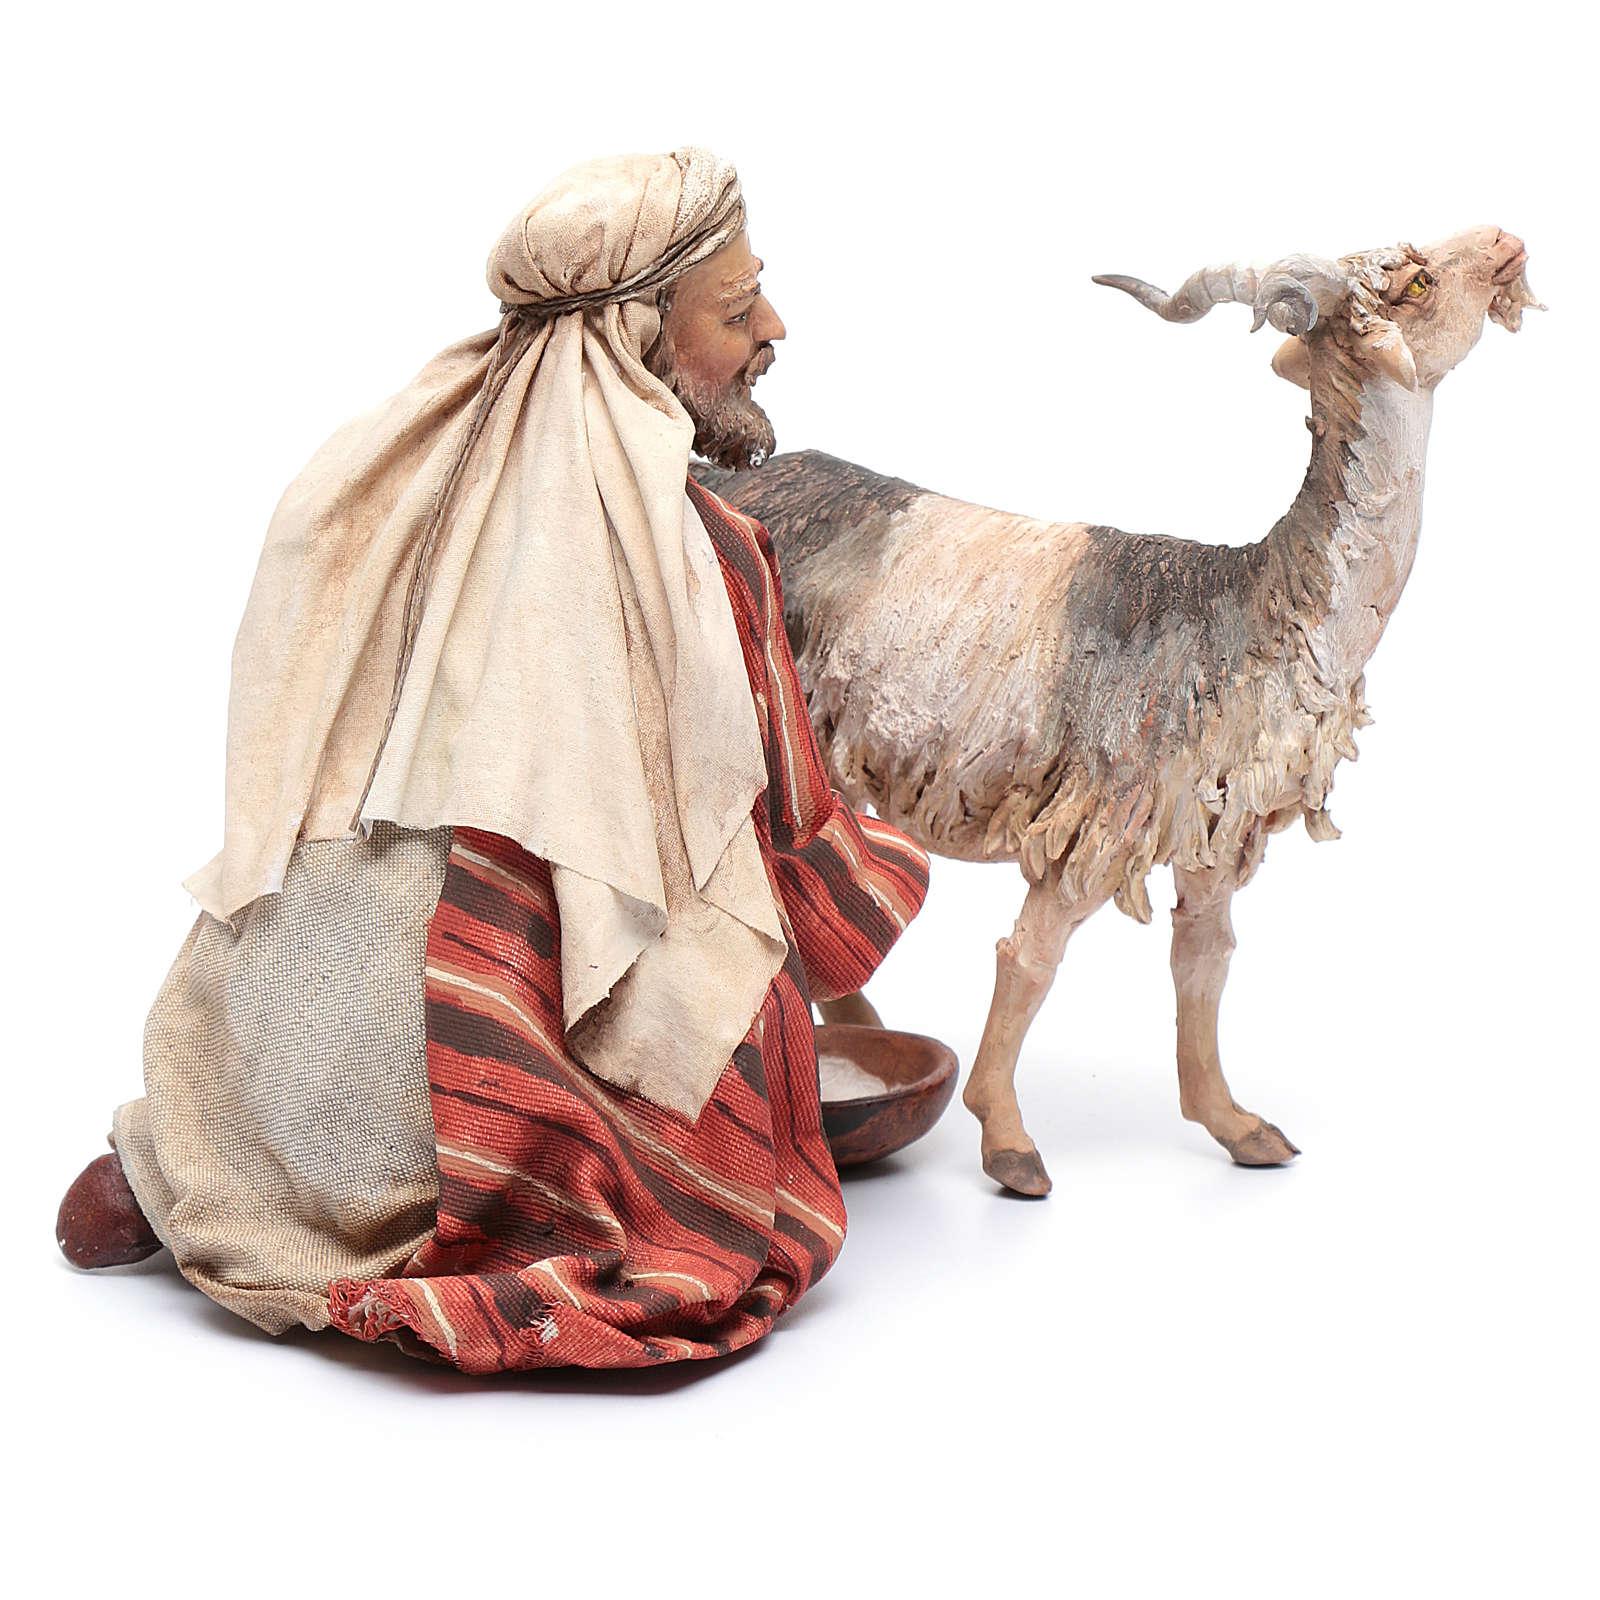 Pastore che munge la capra 30 cm presepe Angela Tripi 4